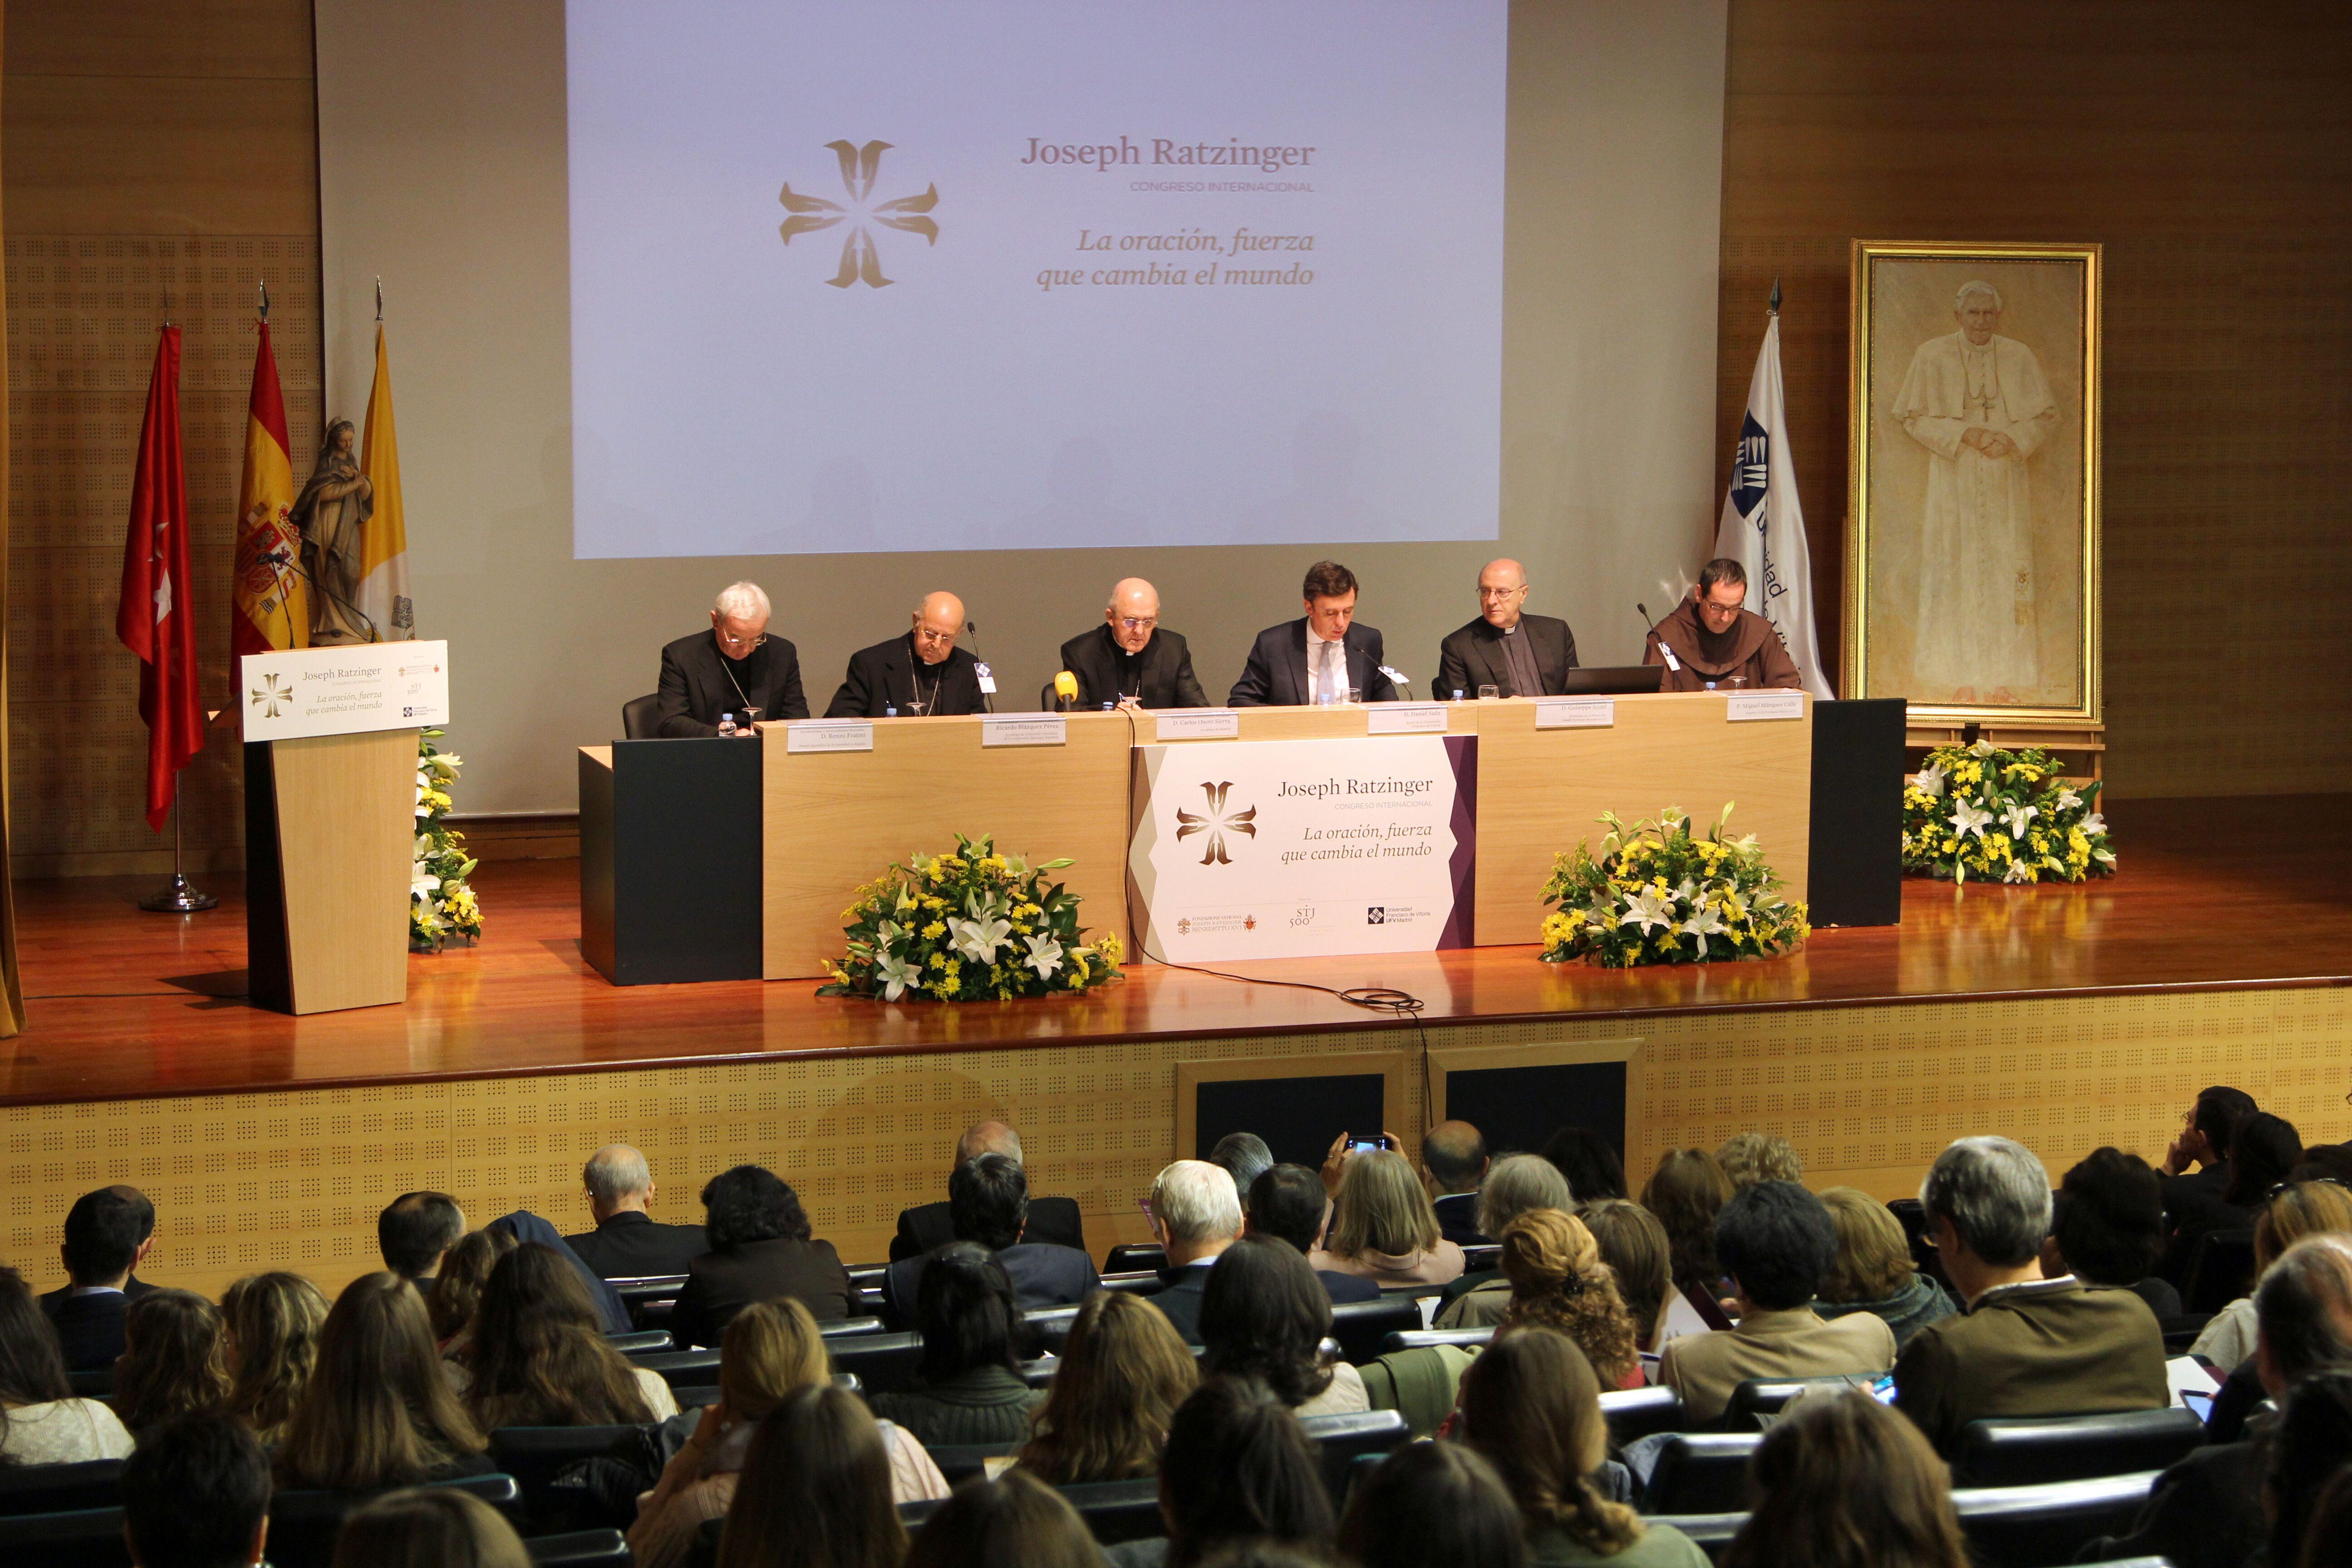 Inauguration of the Fifth International Congress organized by the Joseph Ratzinger – Benedict XVI Vatican Foundation